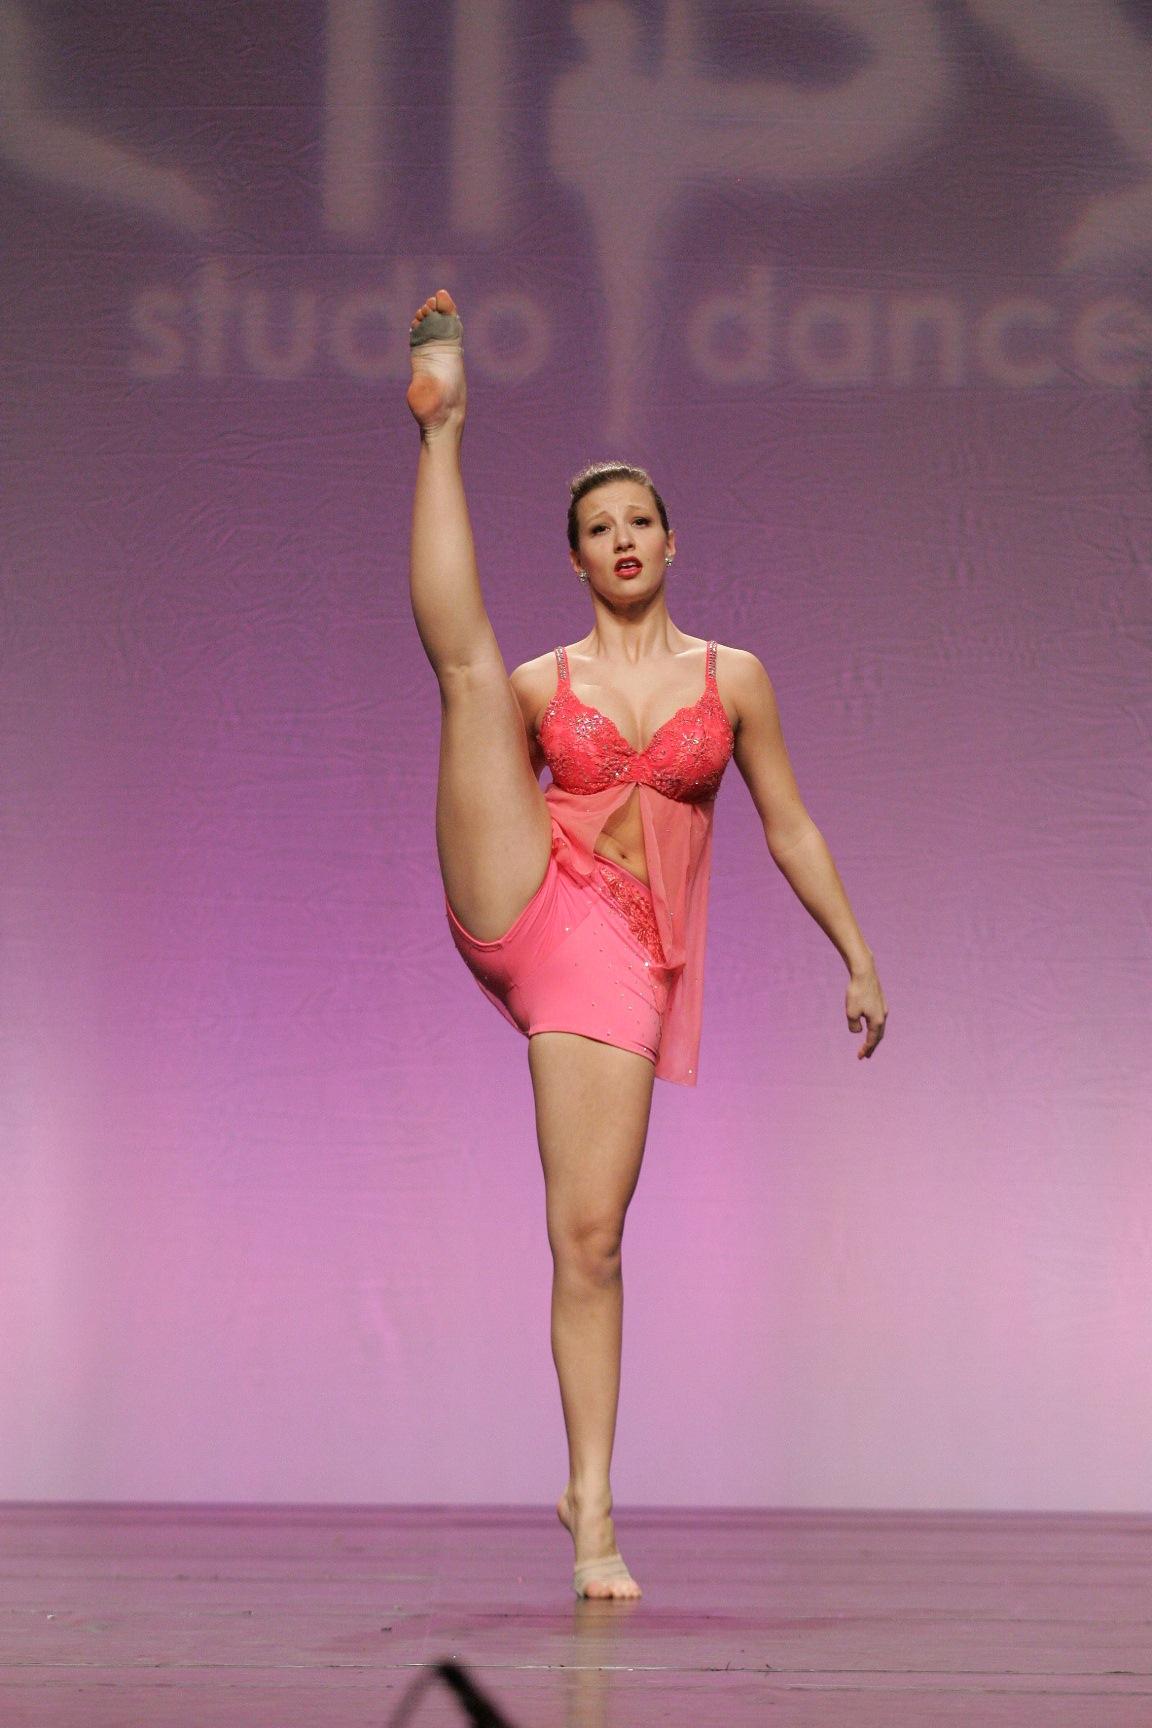 2013 - Caroline Prinzing from Studio One Dance